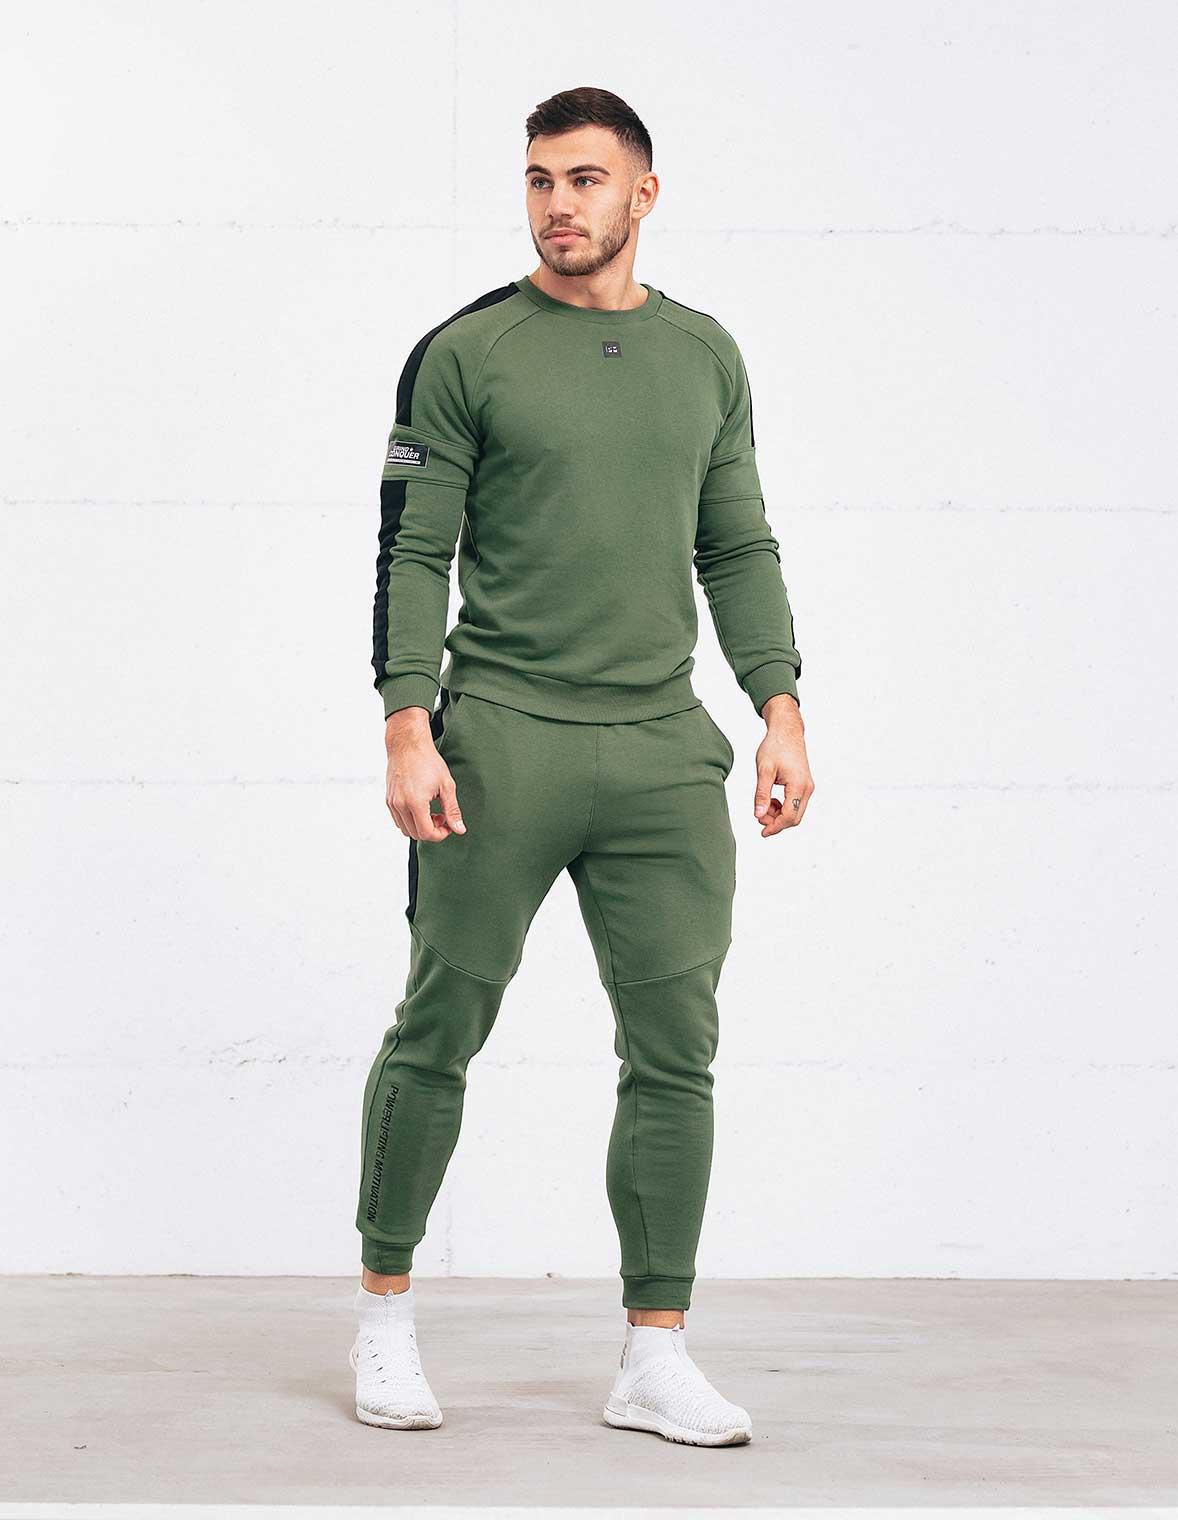 Adapt Army Green Sweatpants